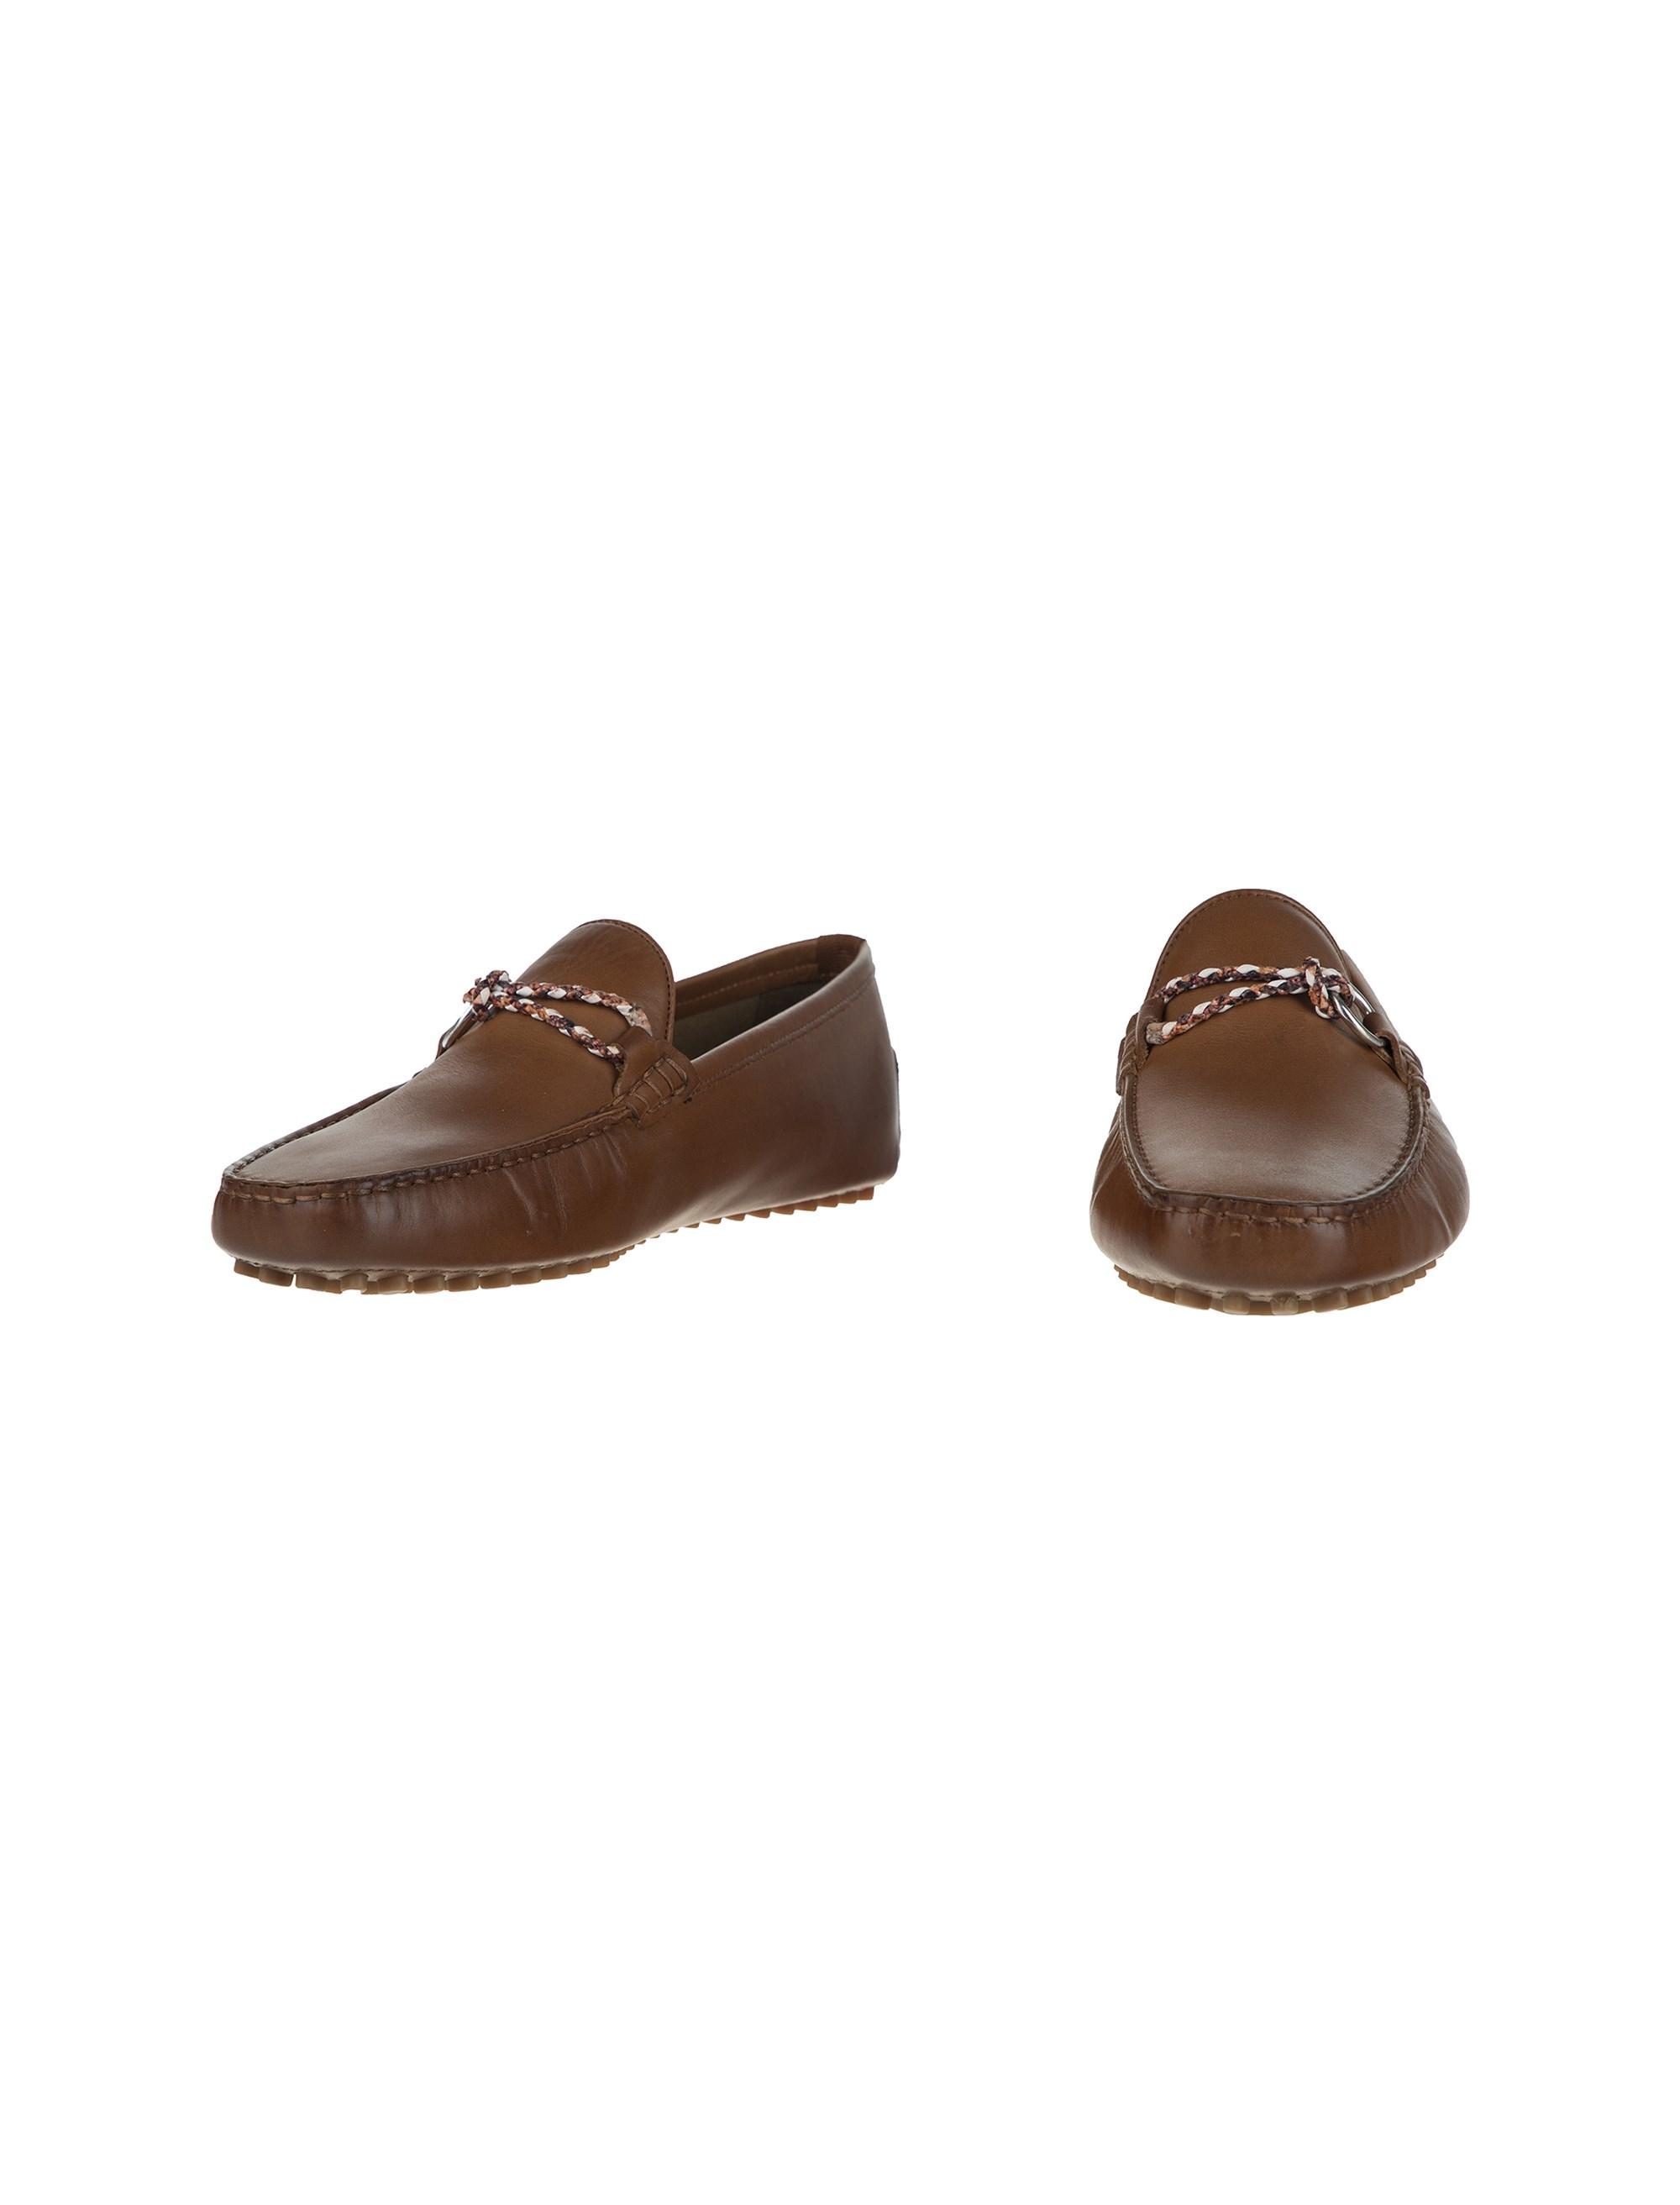 کفش چرم راحتی یکسره مردانه - قهوه اي - 3